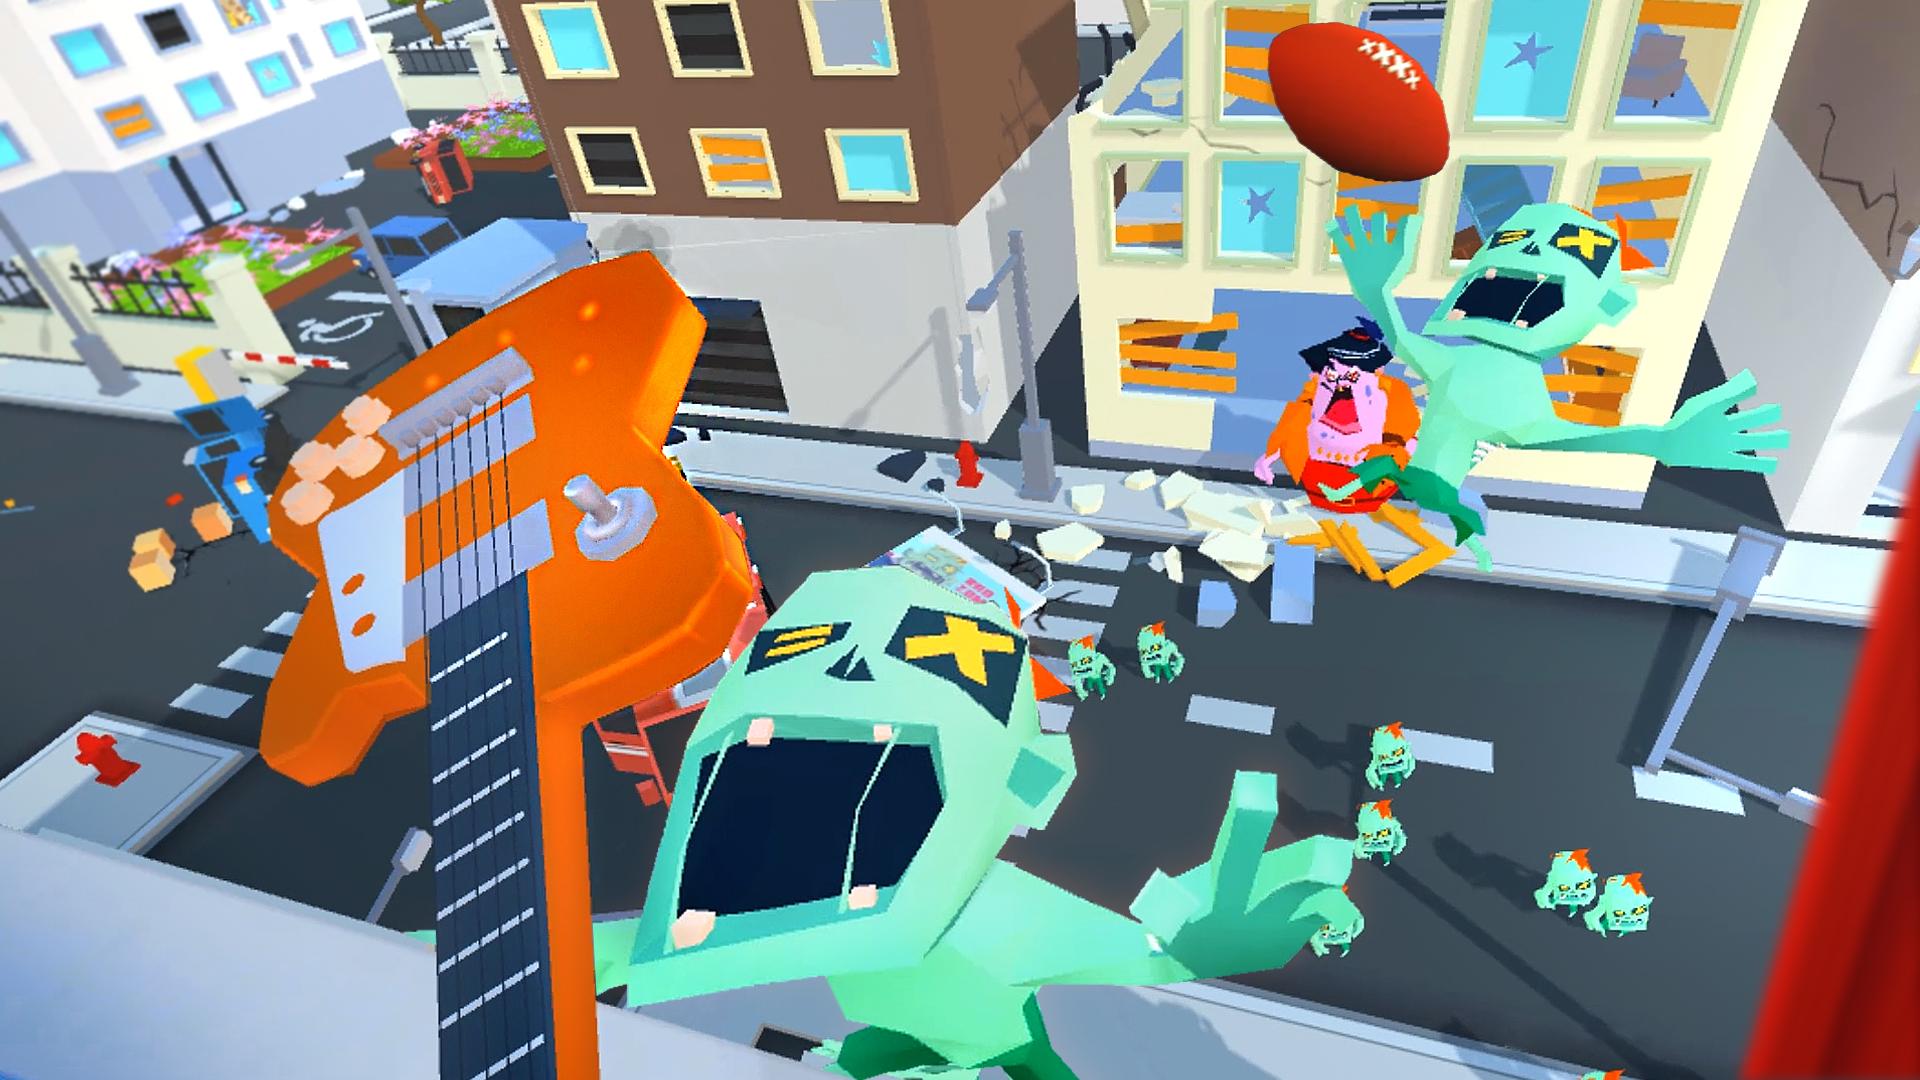 Oculus Quest 游戏《Throw Anything》扔东西砸僵尸插图(3)